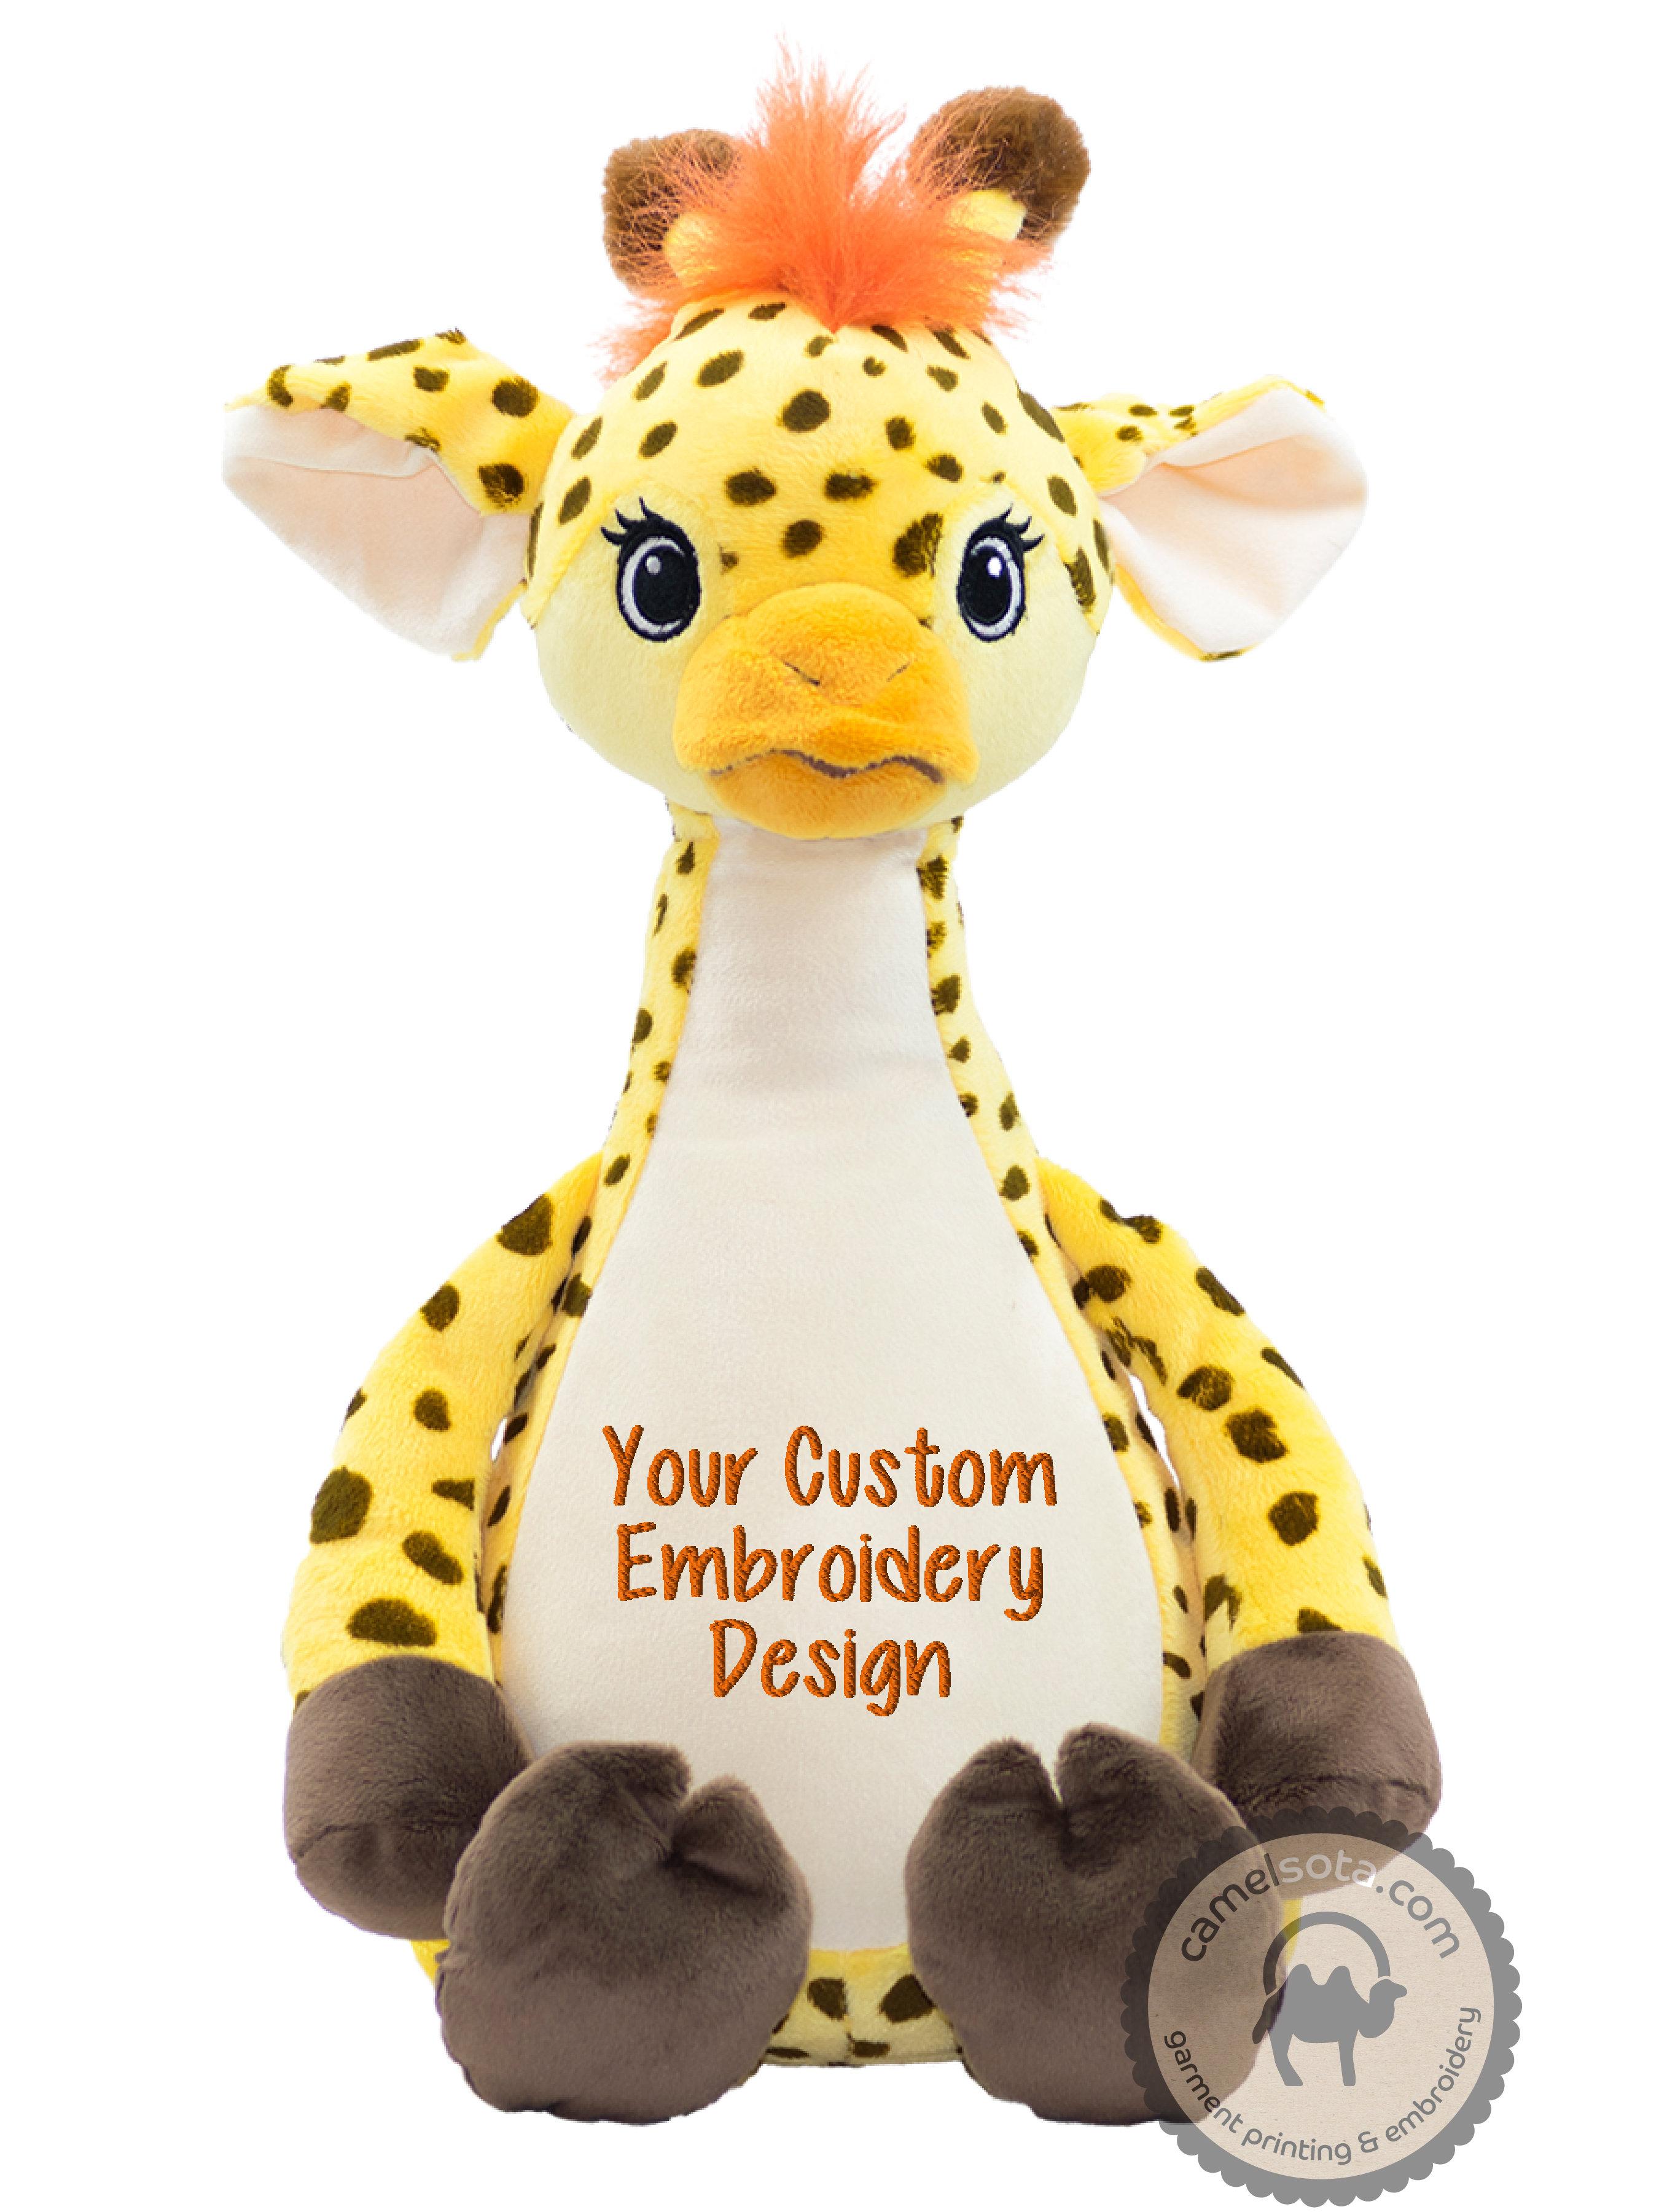 Custom Embroidered Giraffe Cubbie - Tumbleberry Giraffe